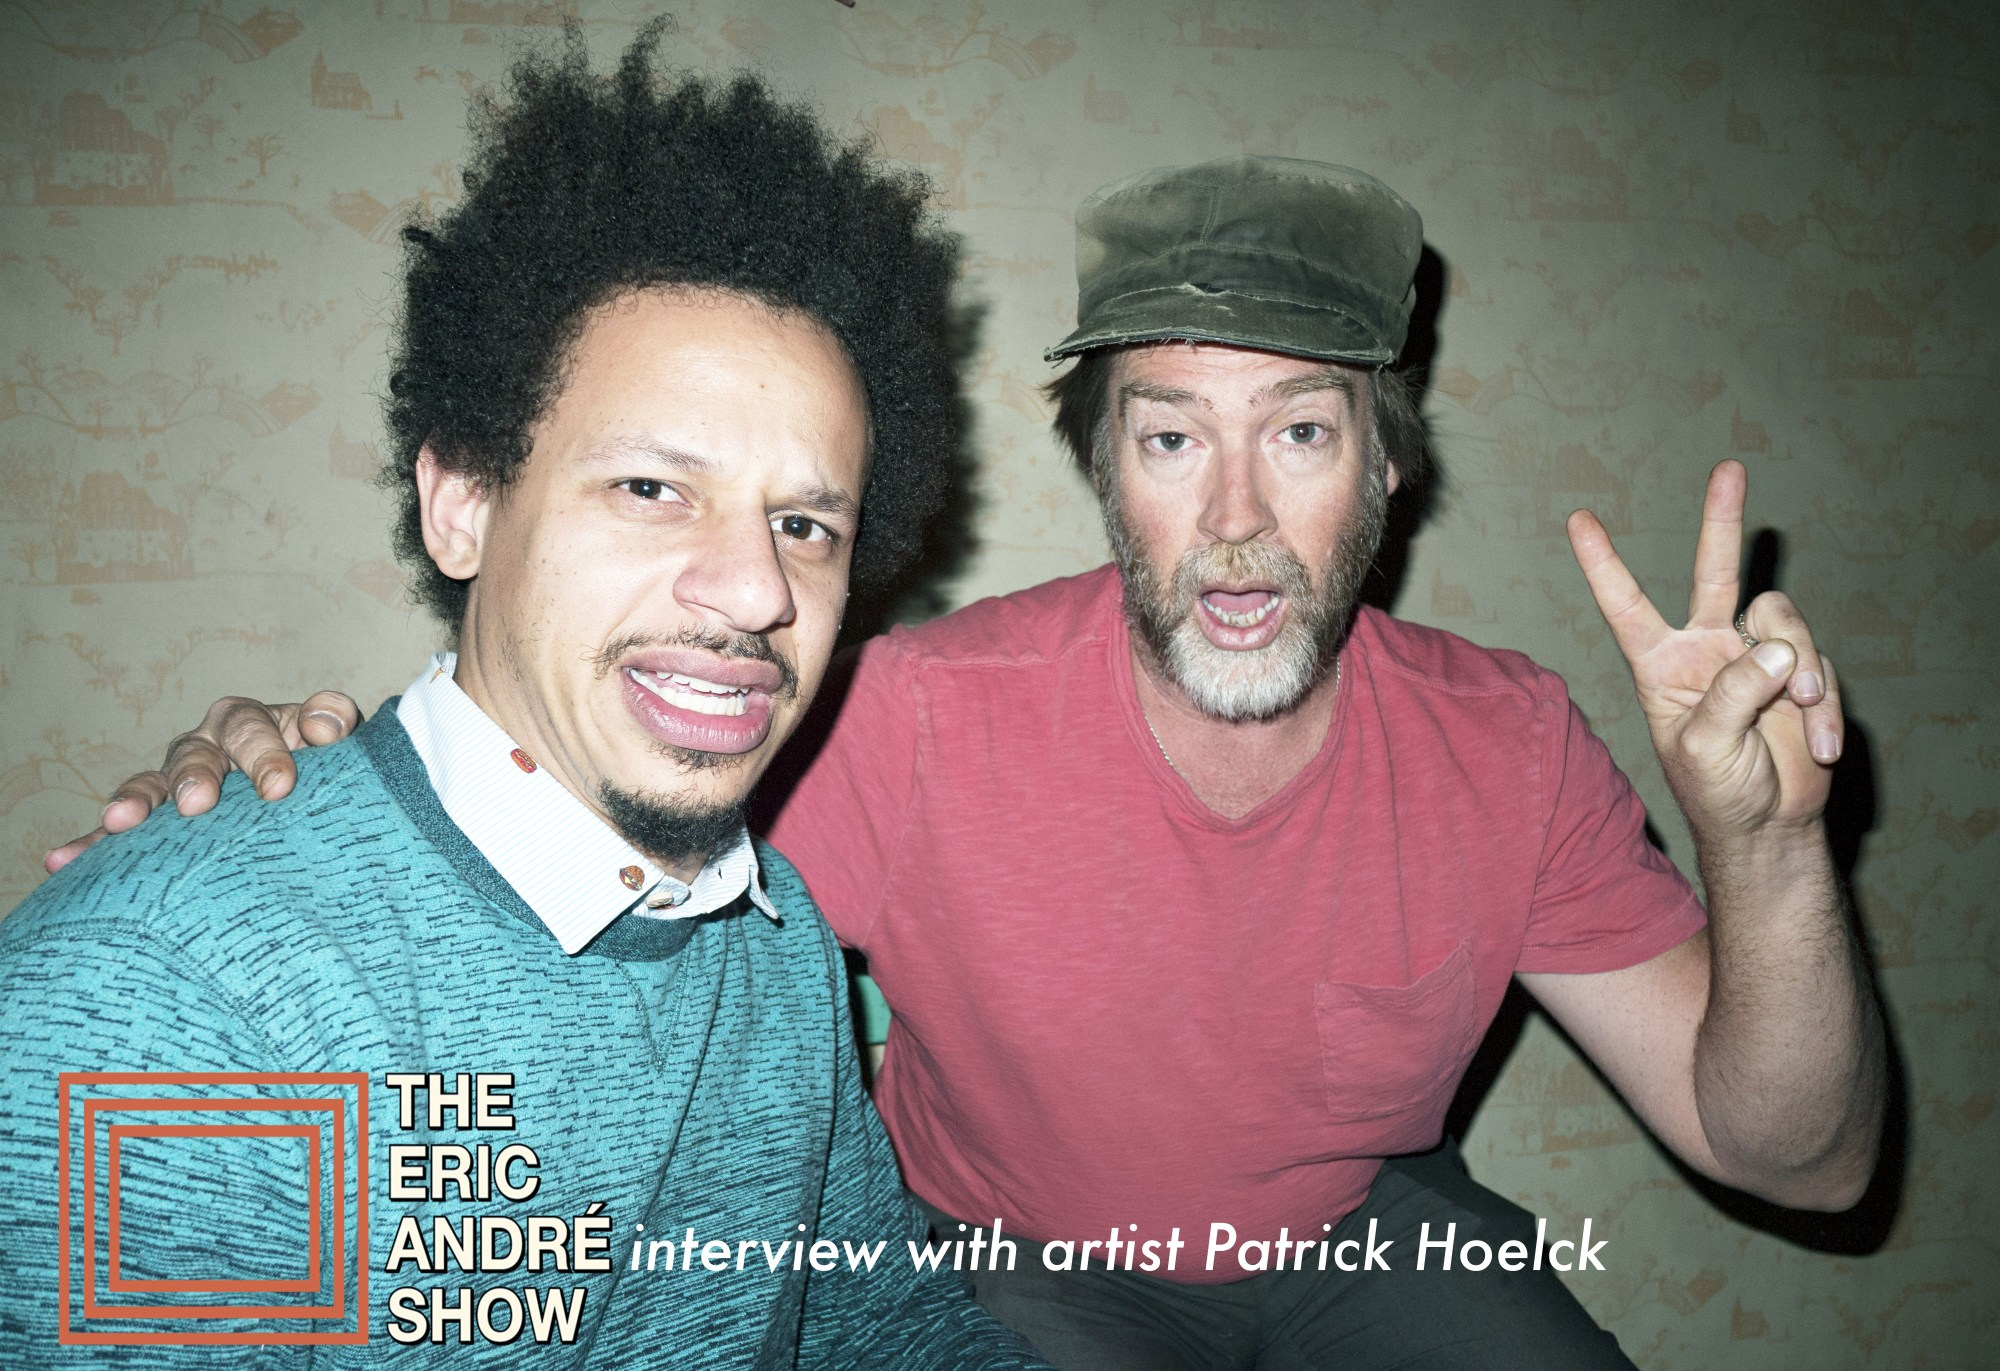 EricAndreShowME 1 - The Eric Andre Show A Fresh Take On Winning The Social Eyeballs